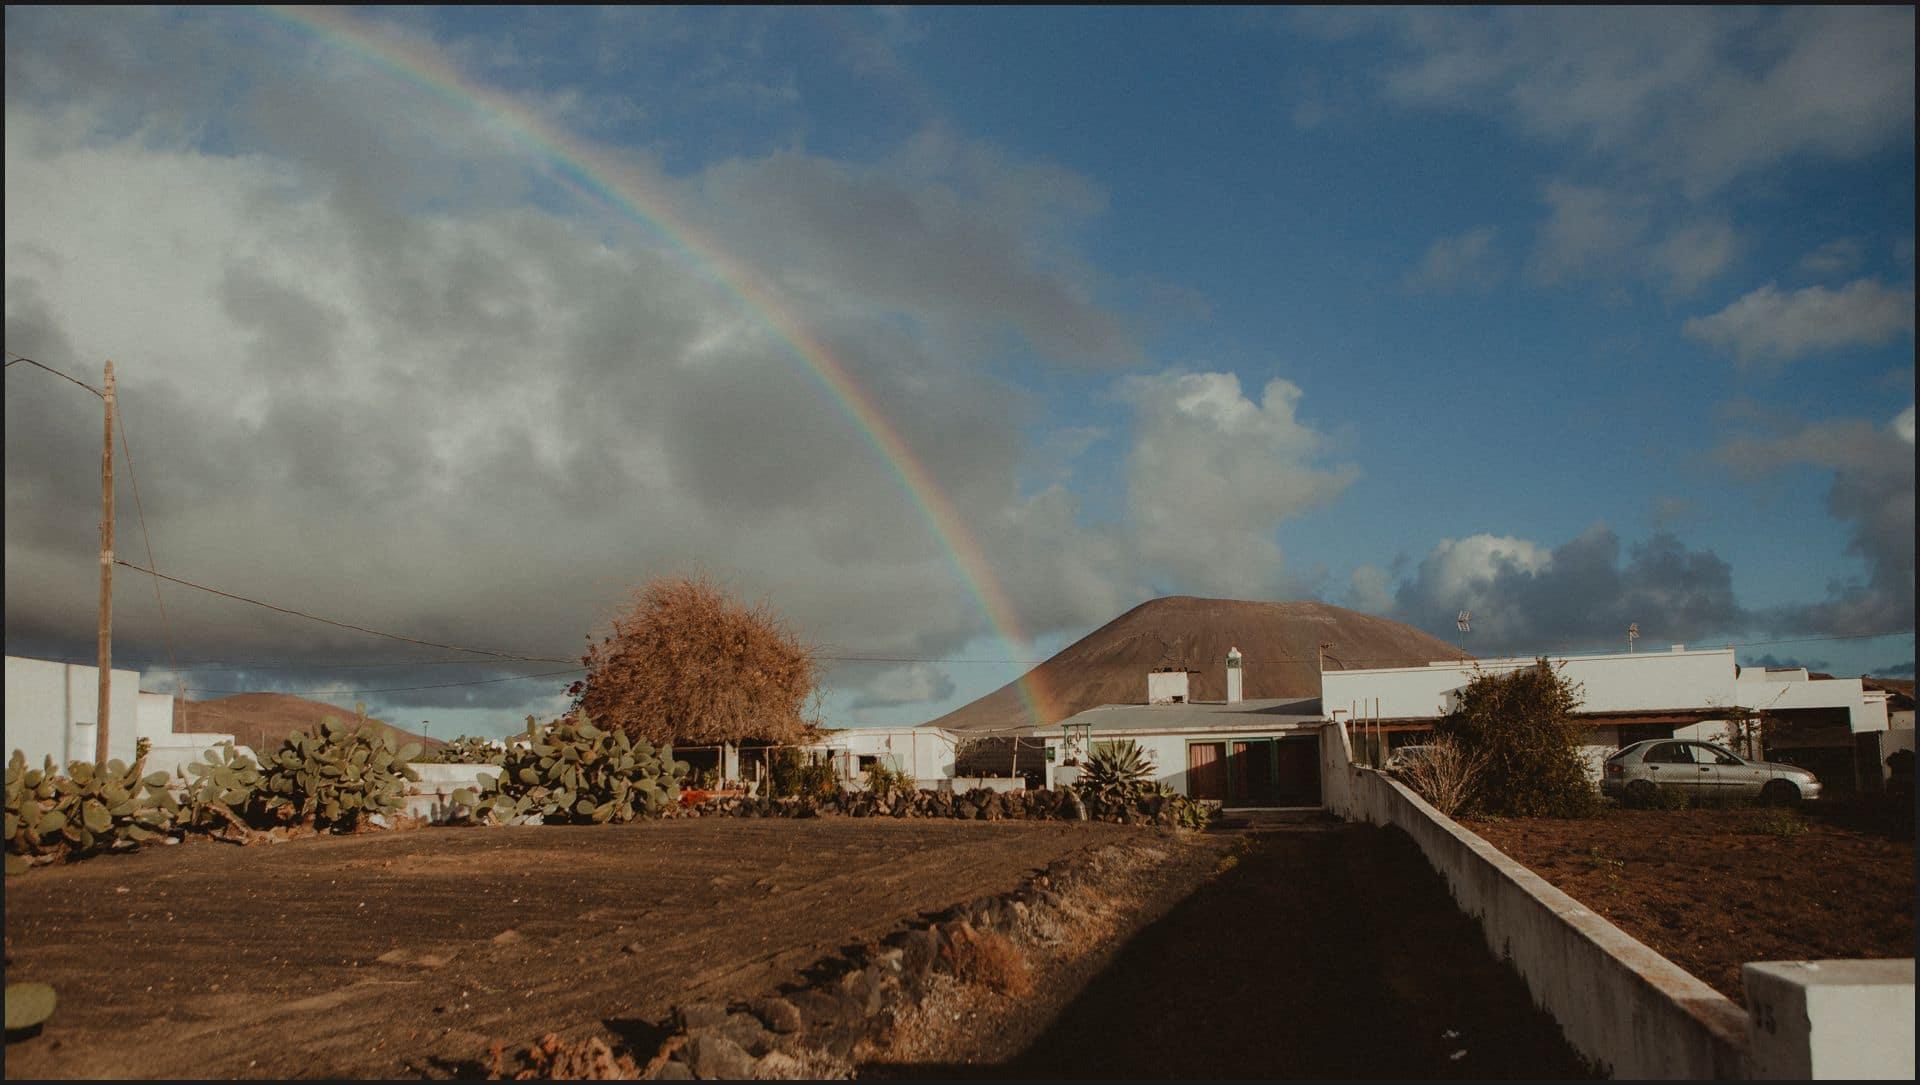 lanzarote, san bartolome, rainbow